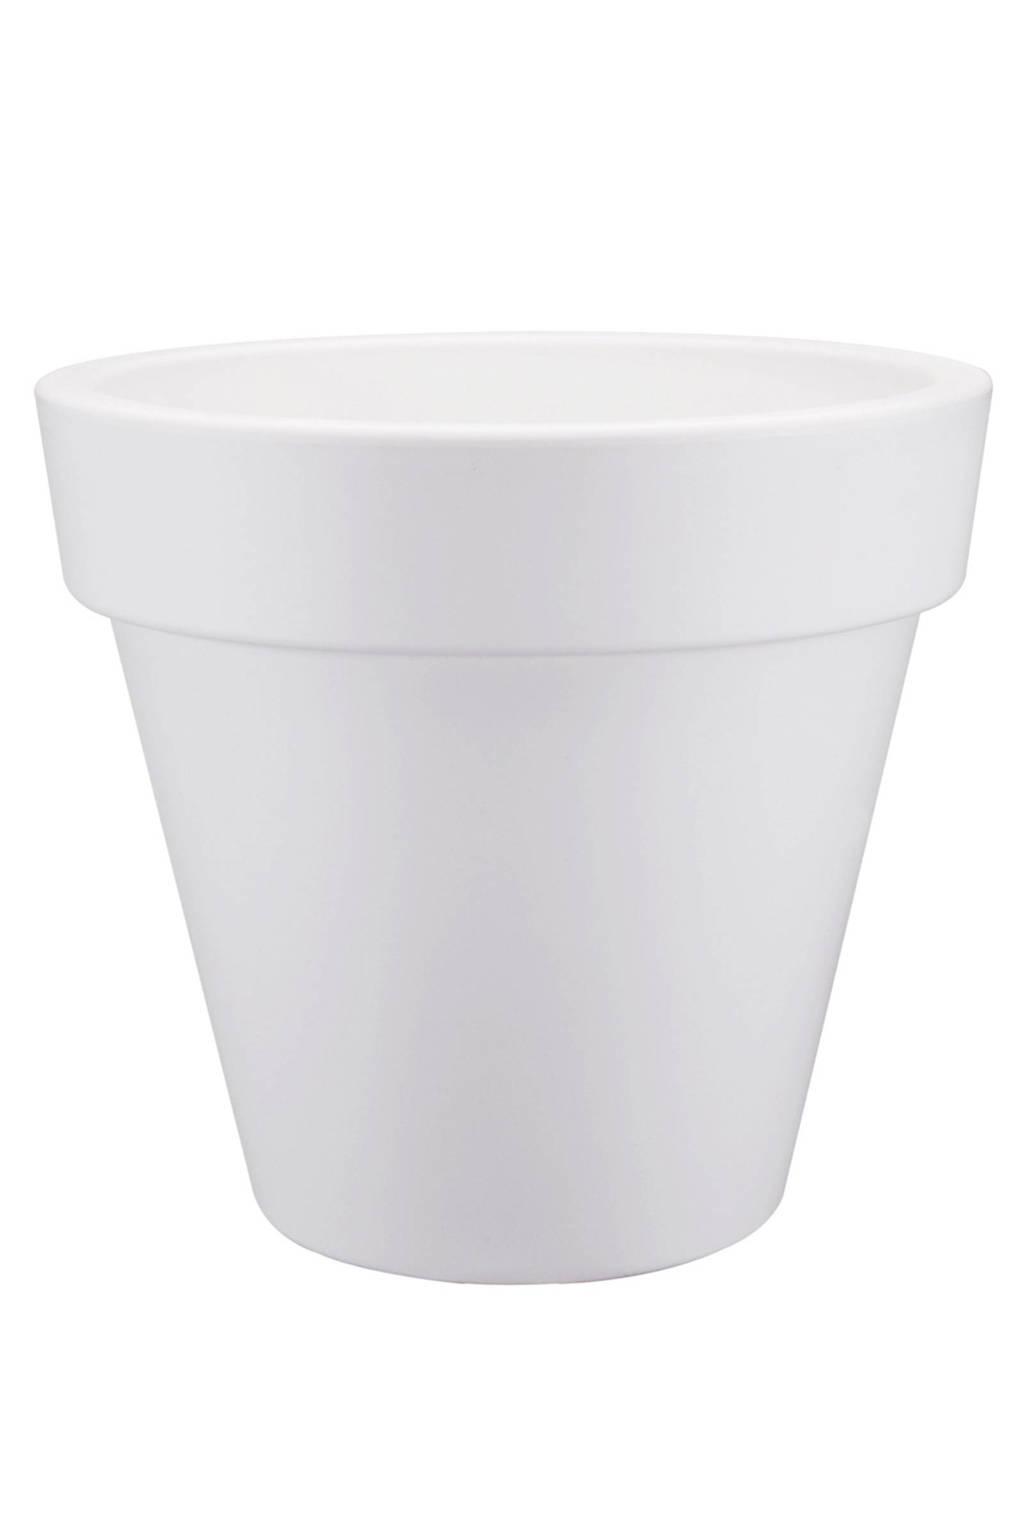 Elho bloempot pure round (ø60 cm), Wit